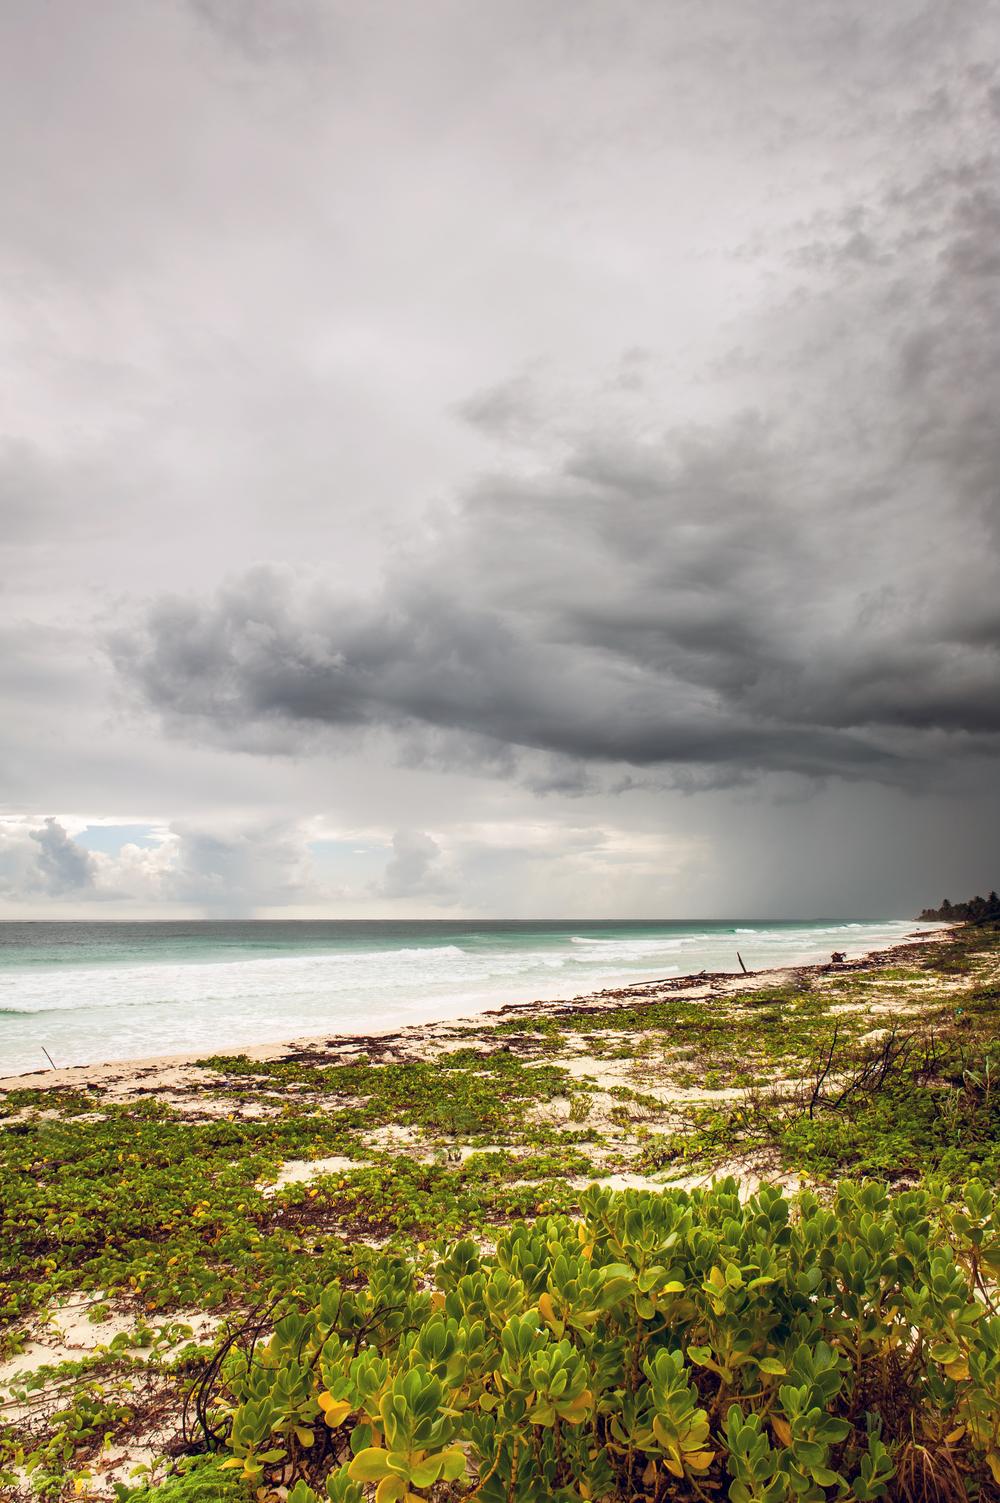 cancun 2013.2014-5-2.jpg